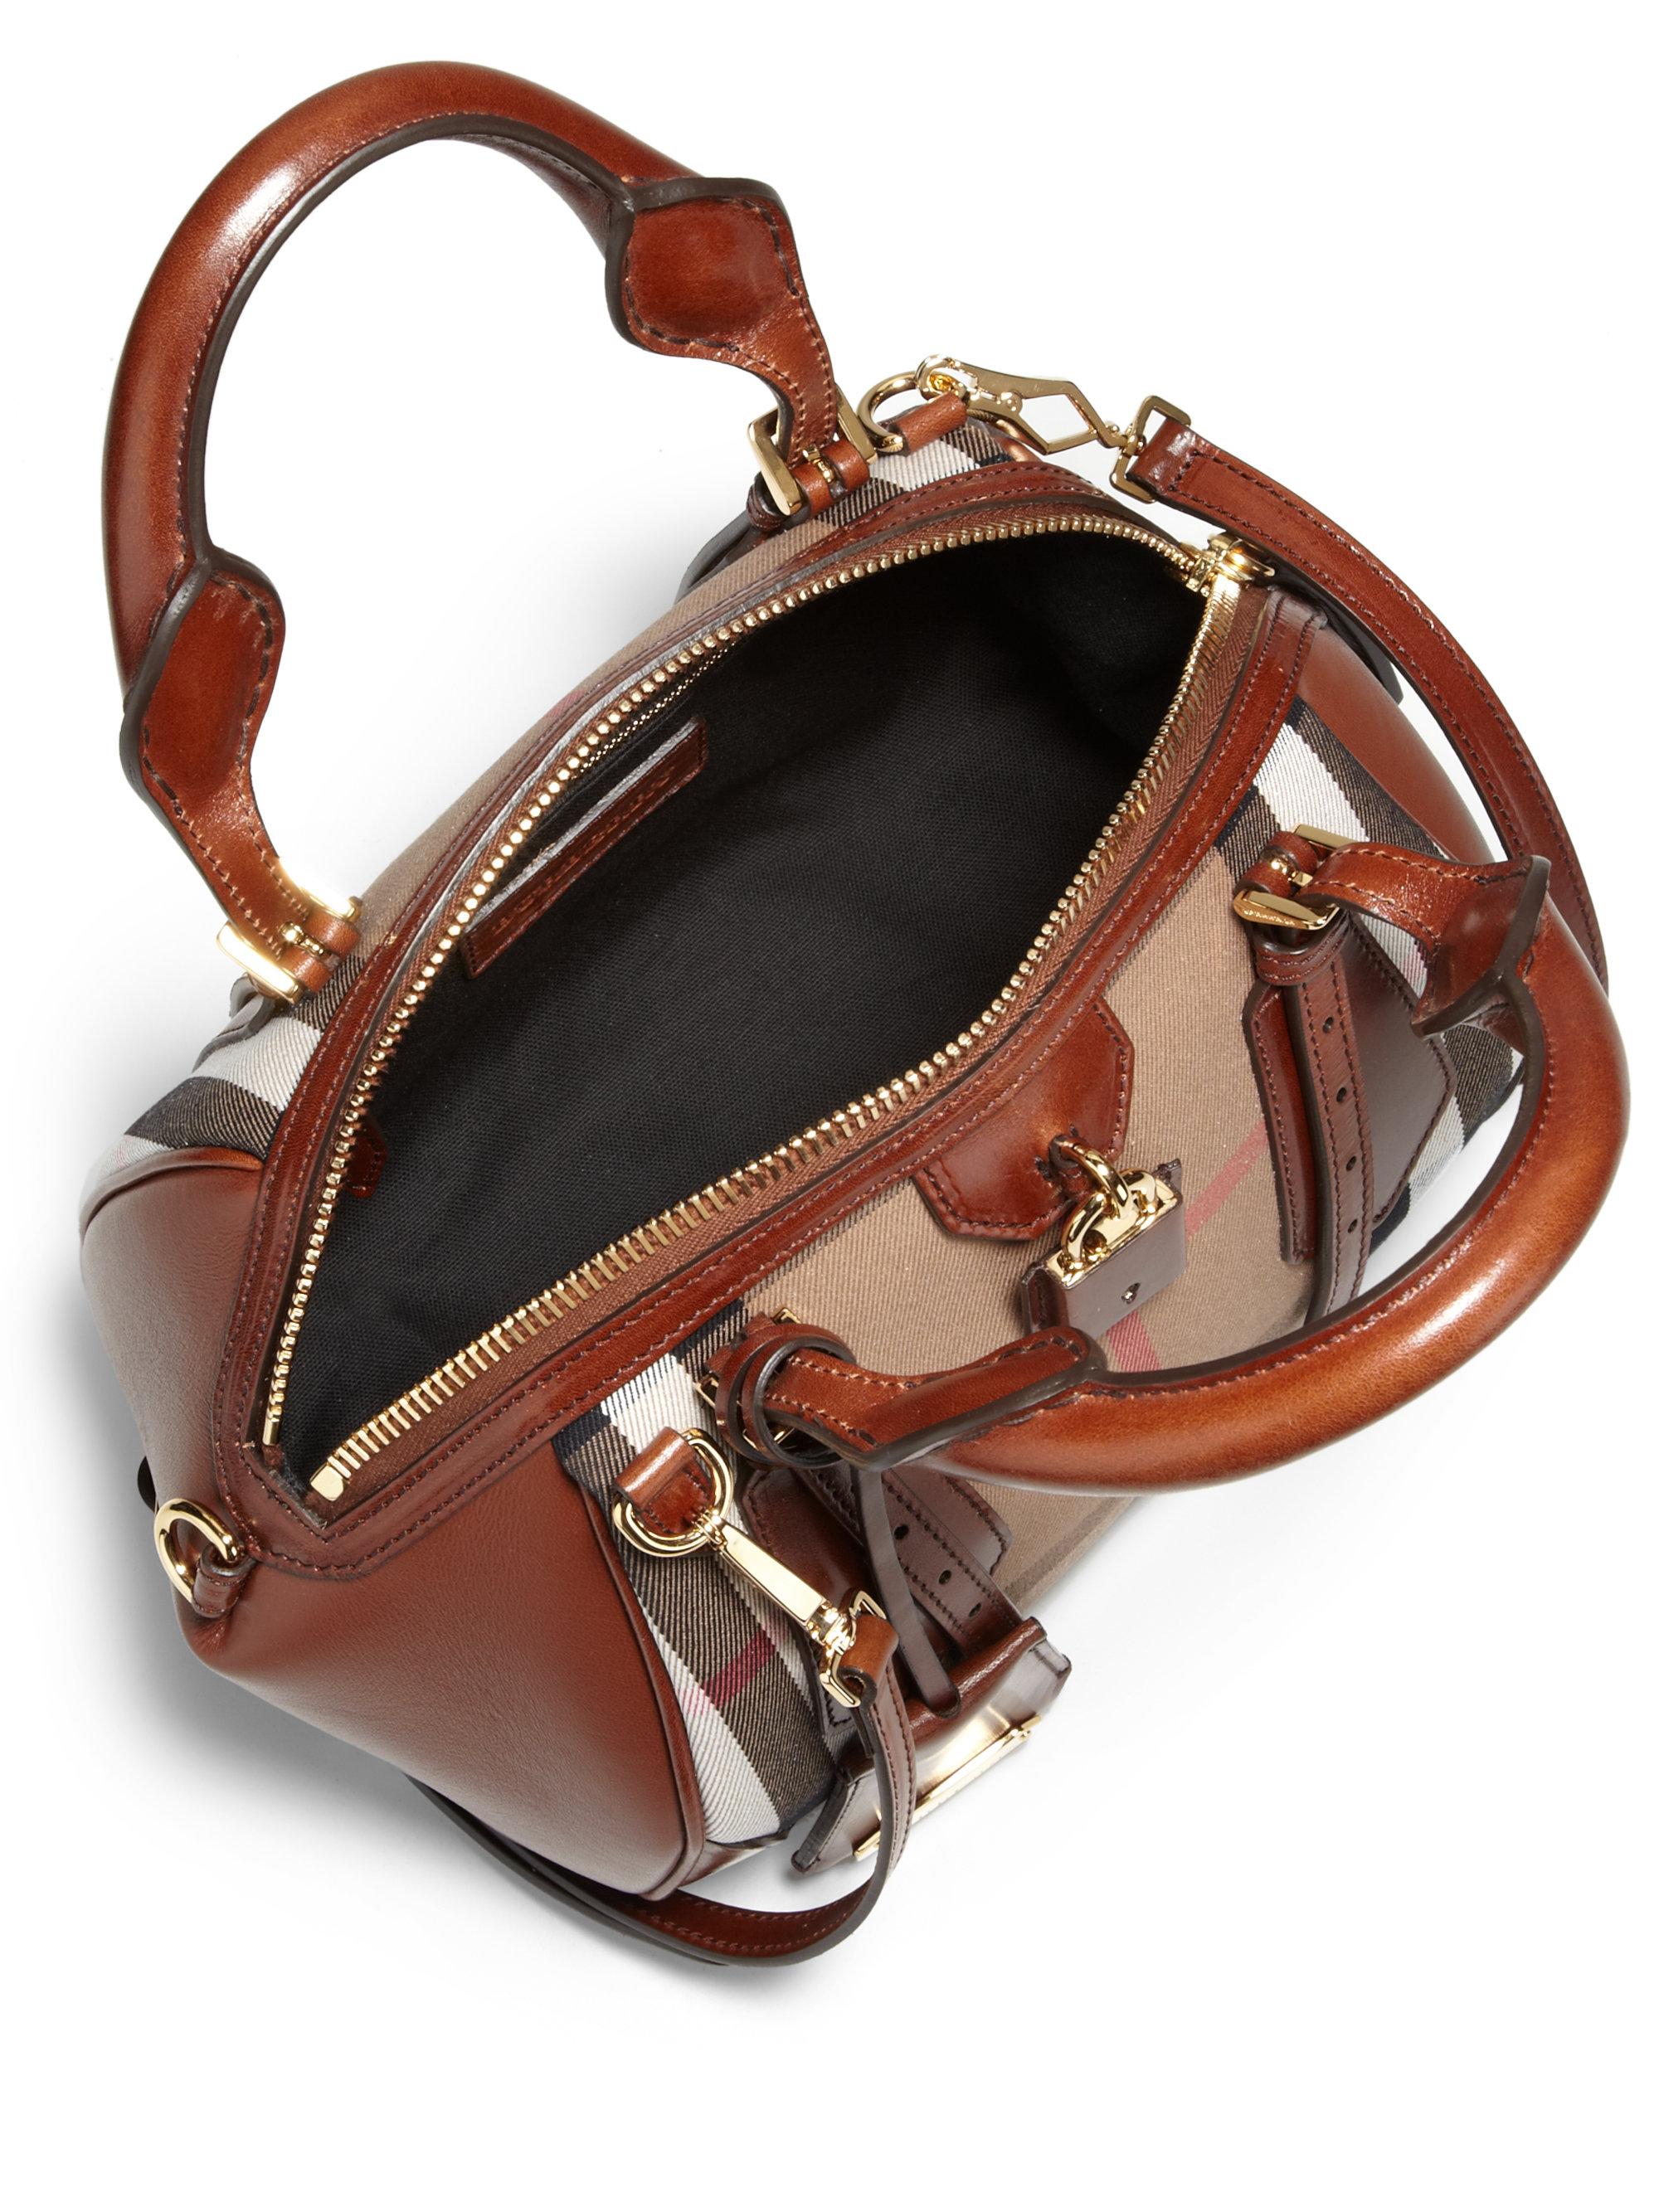 5e763ff5ac9f Lyst - Burberry Blaze Satchel Handbag in Brown